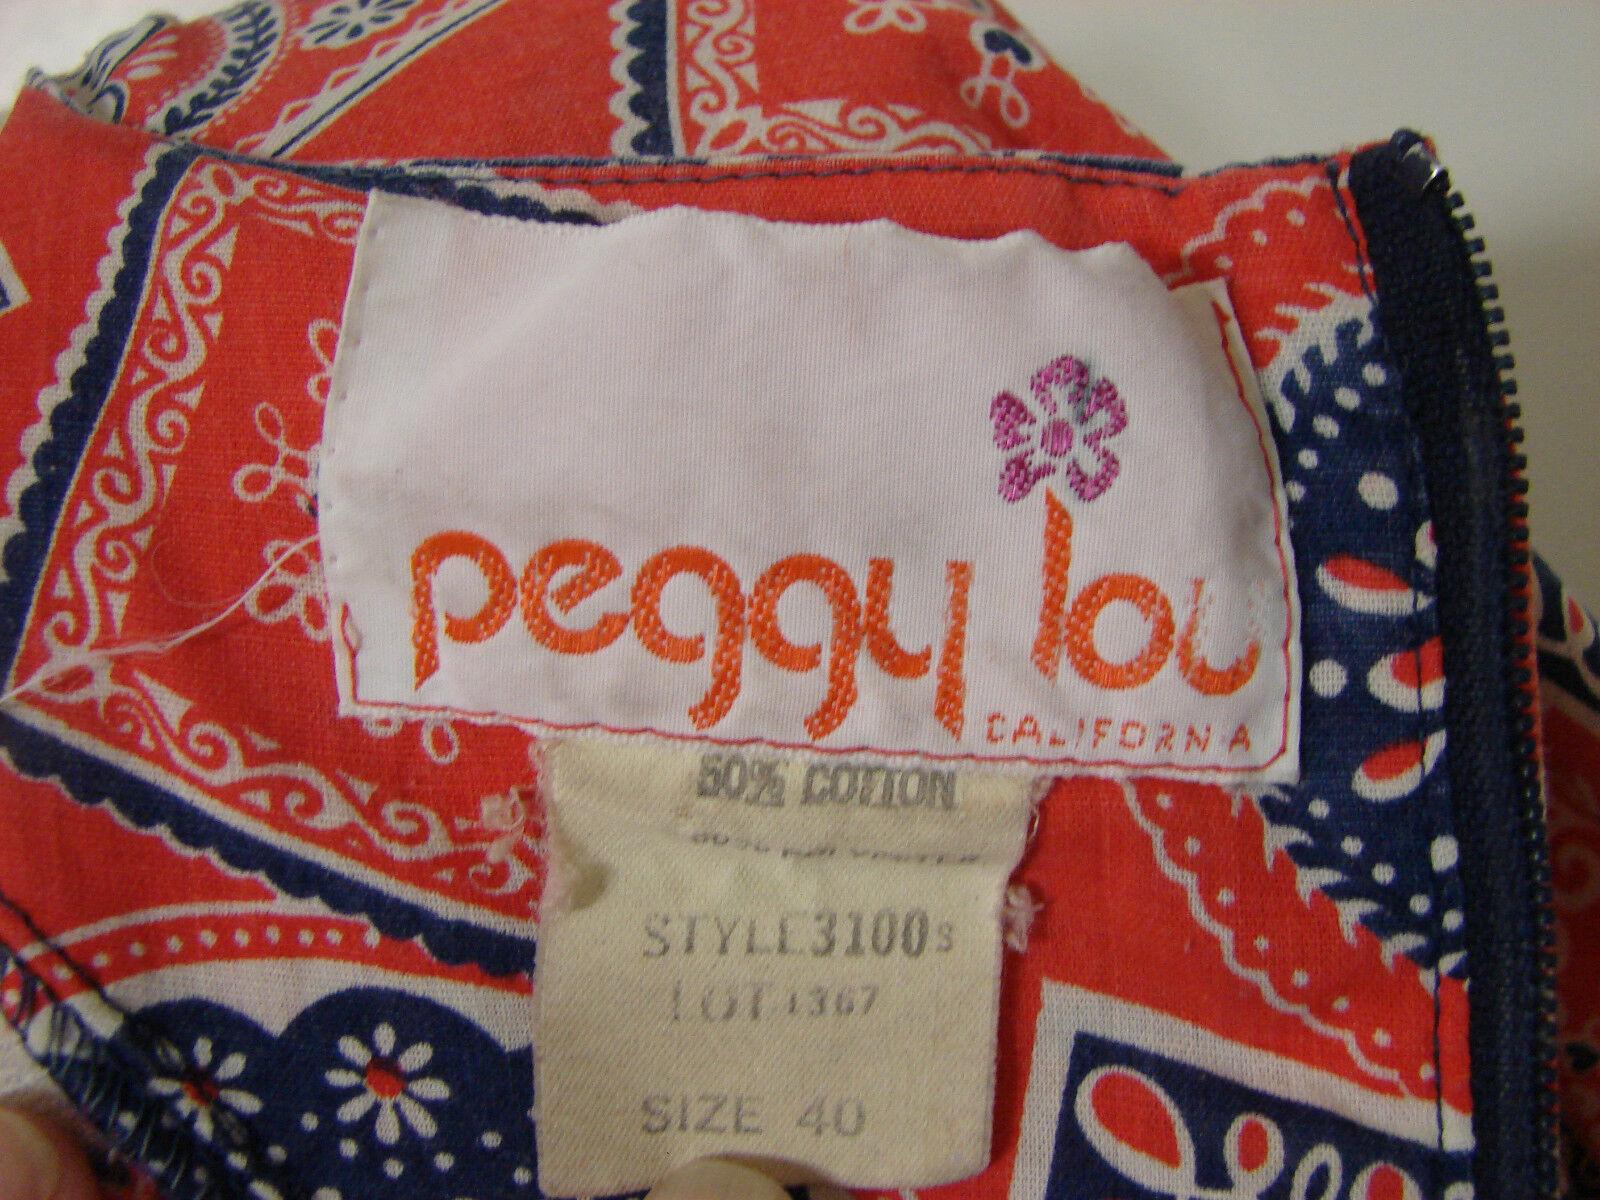 PEGGY LOU Caftan Dress Vintage 1960's Groovy Patc… - image 9